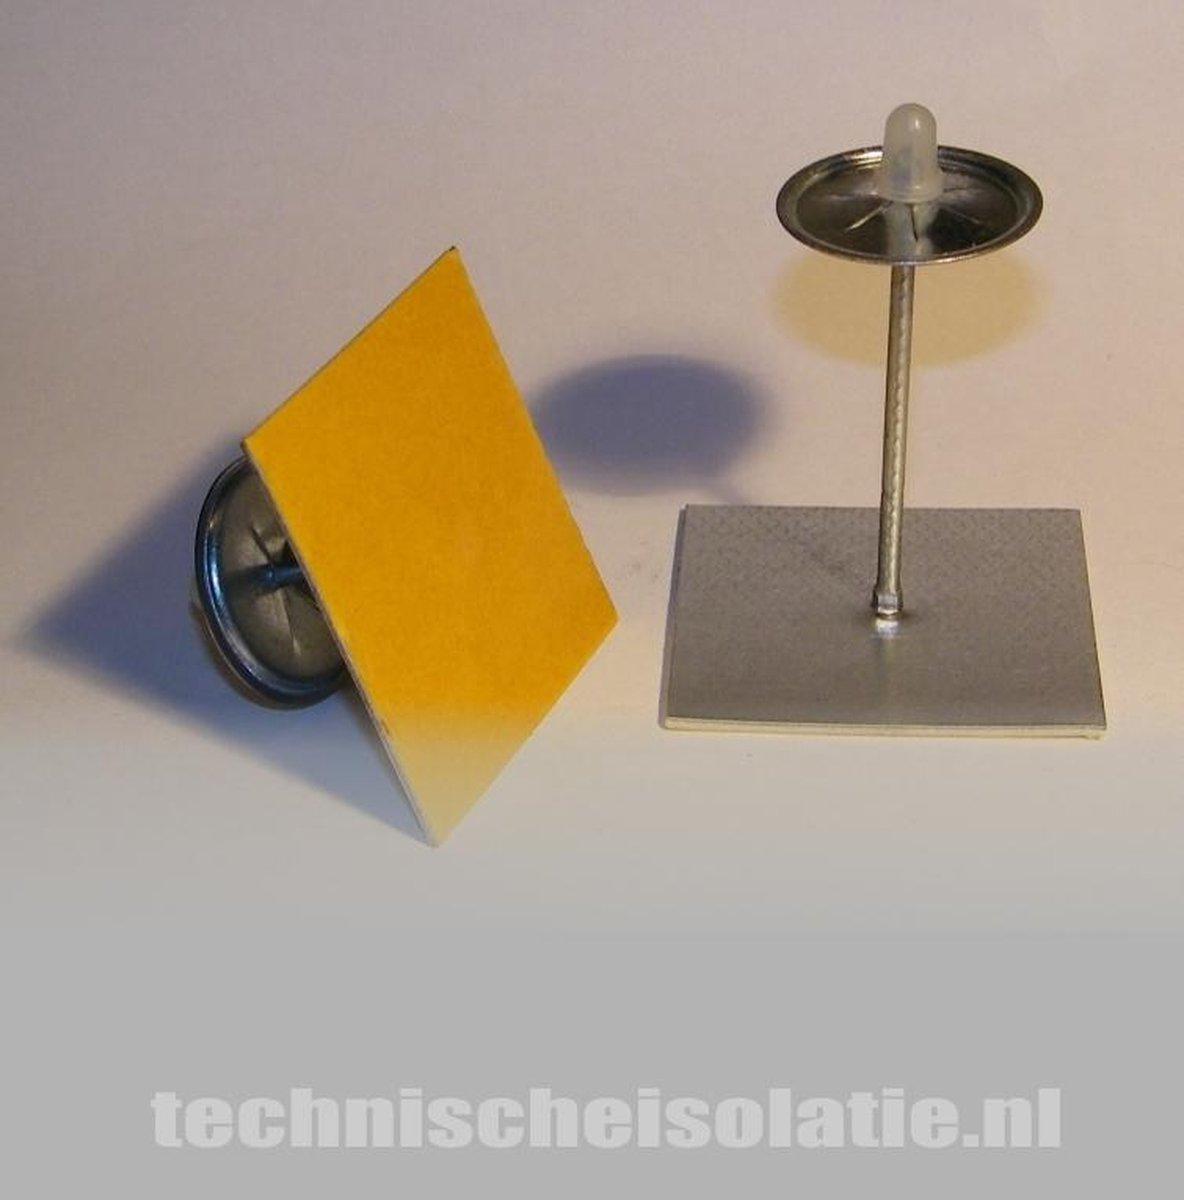 Zelfklevende isolatie plakpennen 53mm - Novaplus